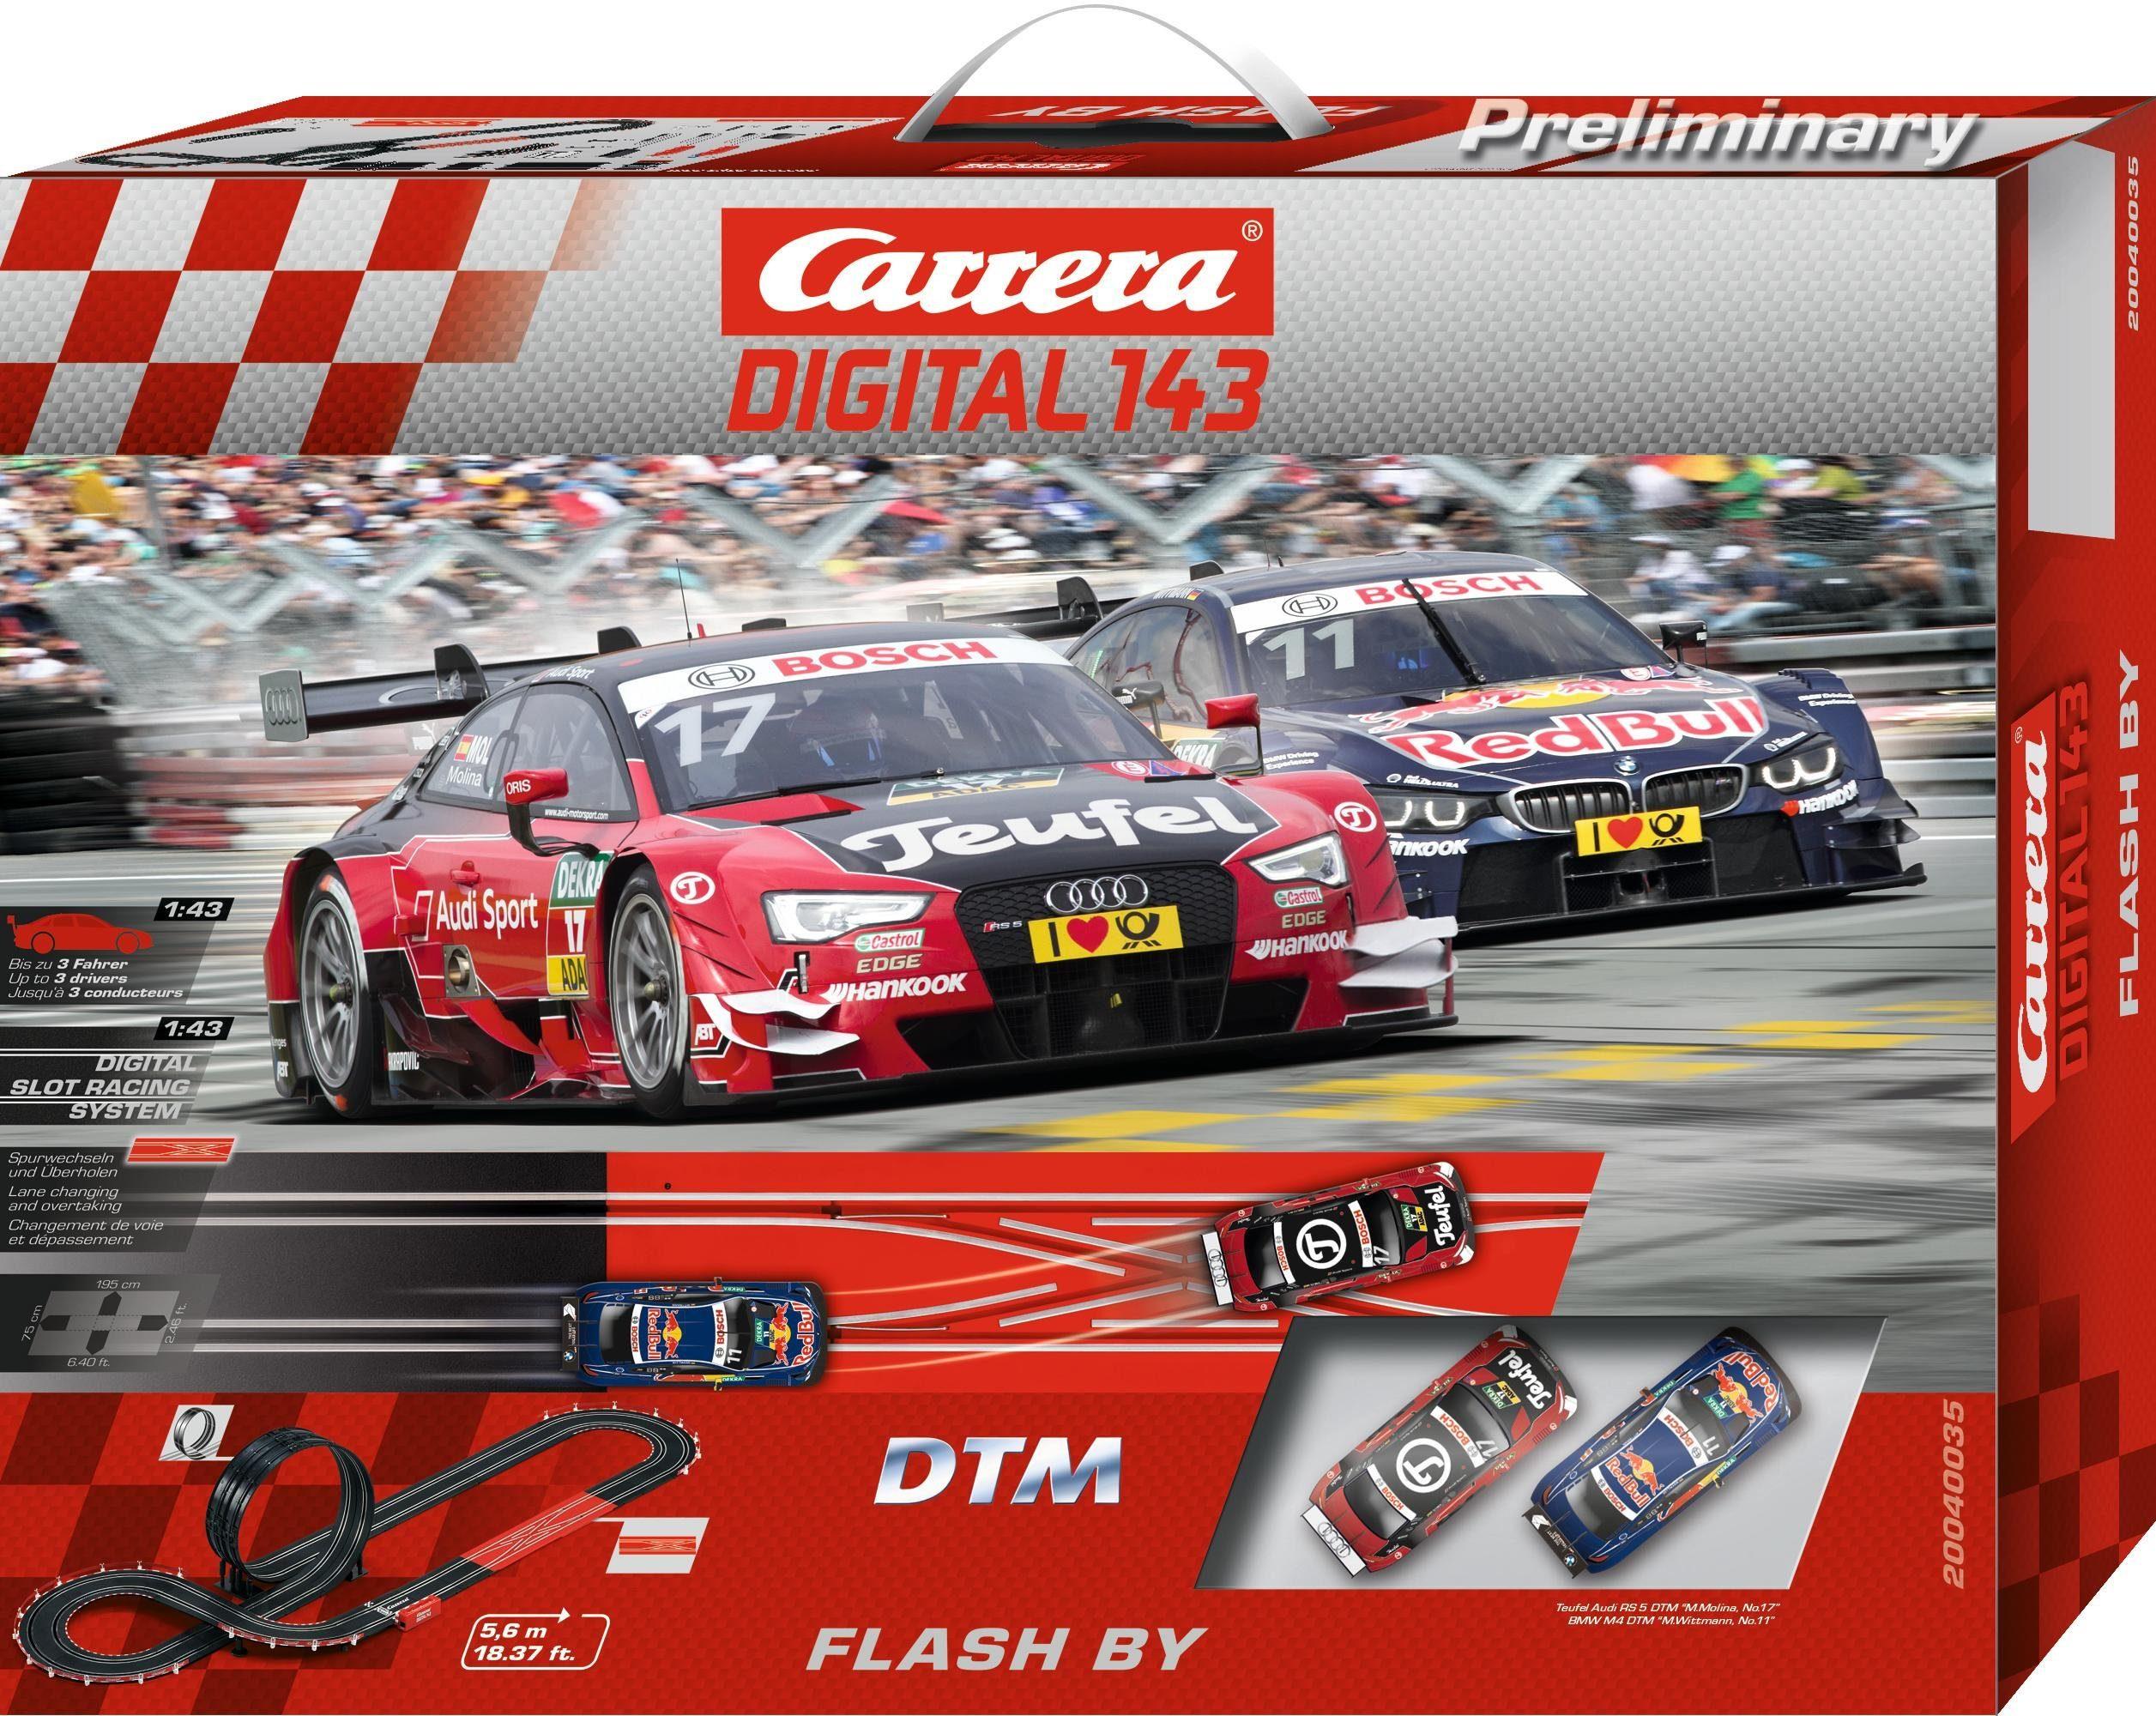 Carrera Autorennbahn, »Carrera® Digital 143 DTM Flash By«